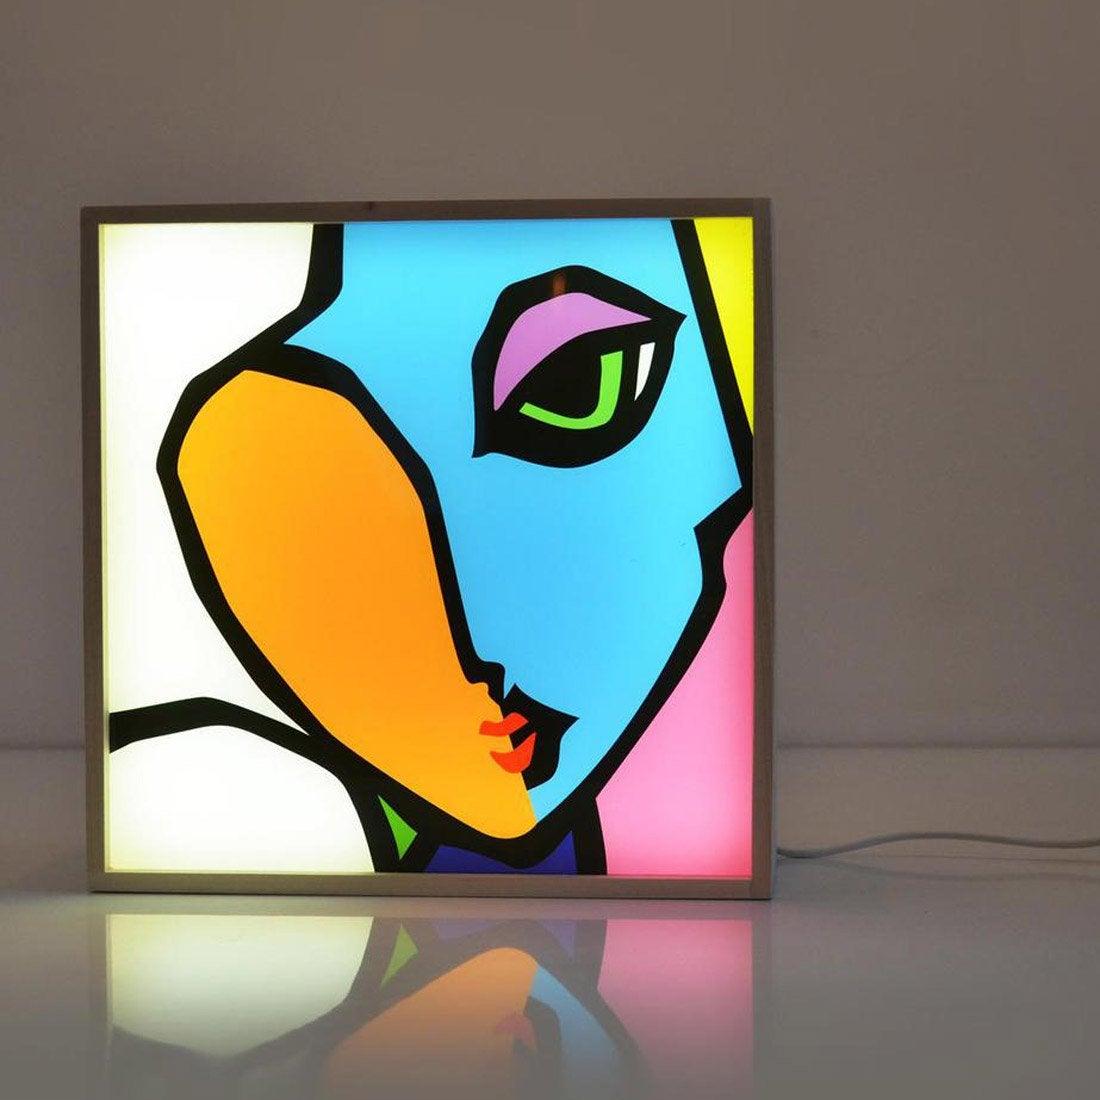 Boîte lumineuse, design, pvc multicouleur, DADA LIGHT LOVELY WINK